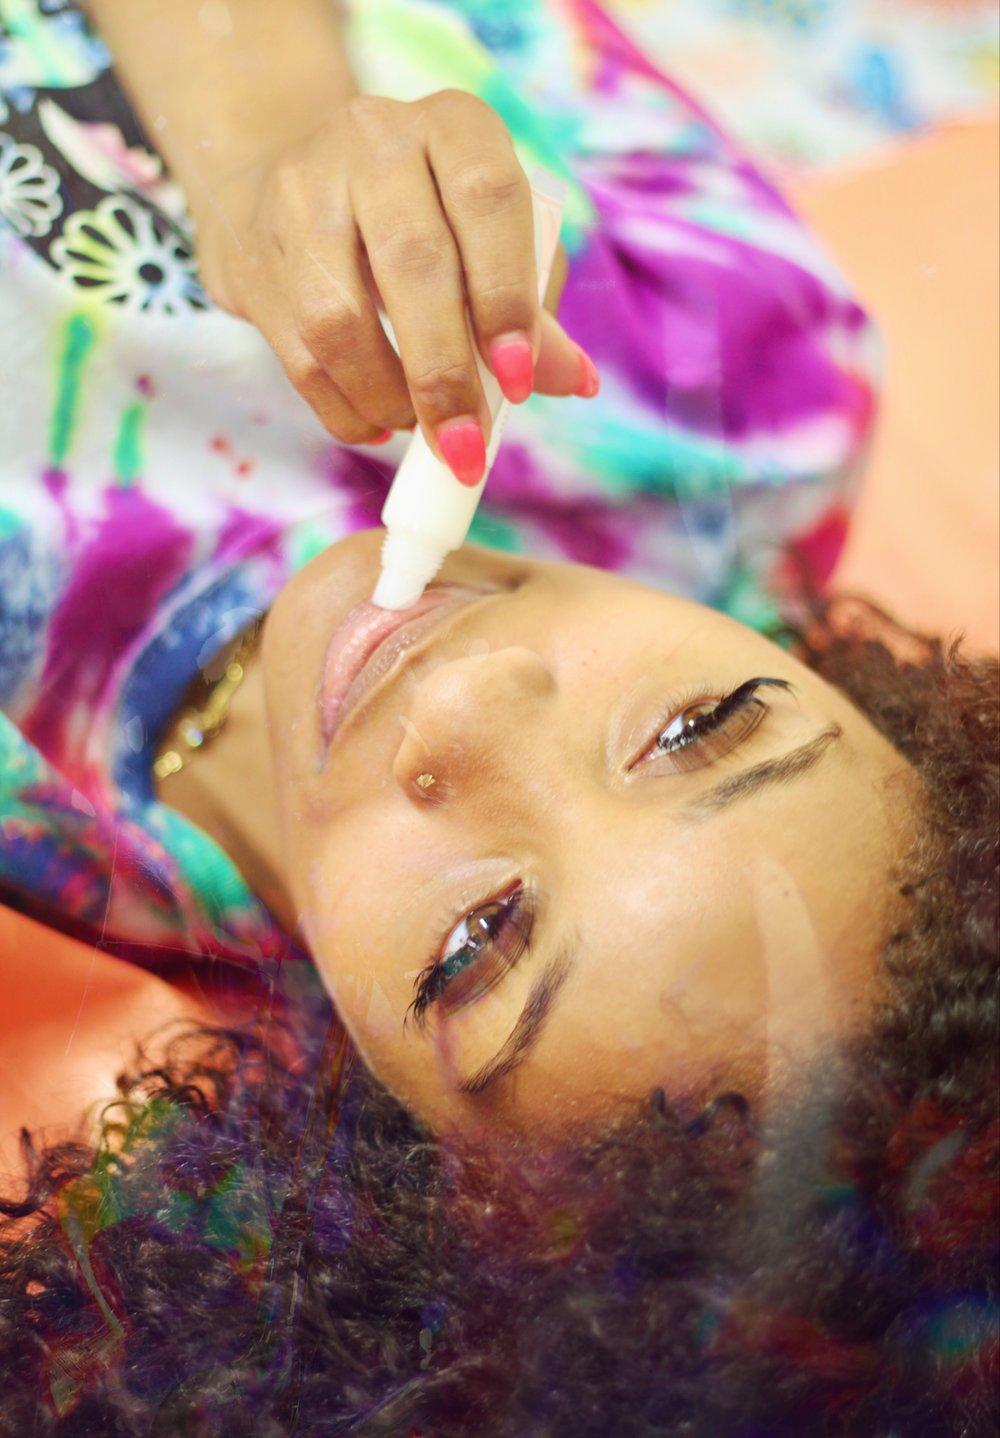 Image of Dez Beauty's Cream lip gloss